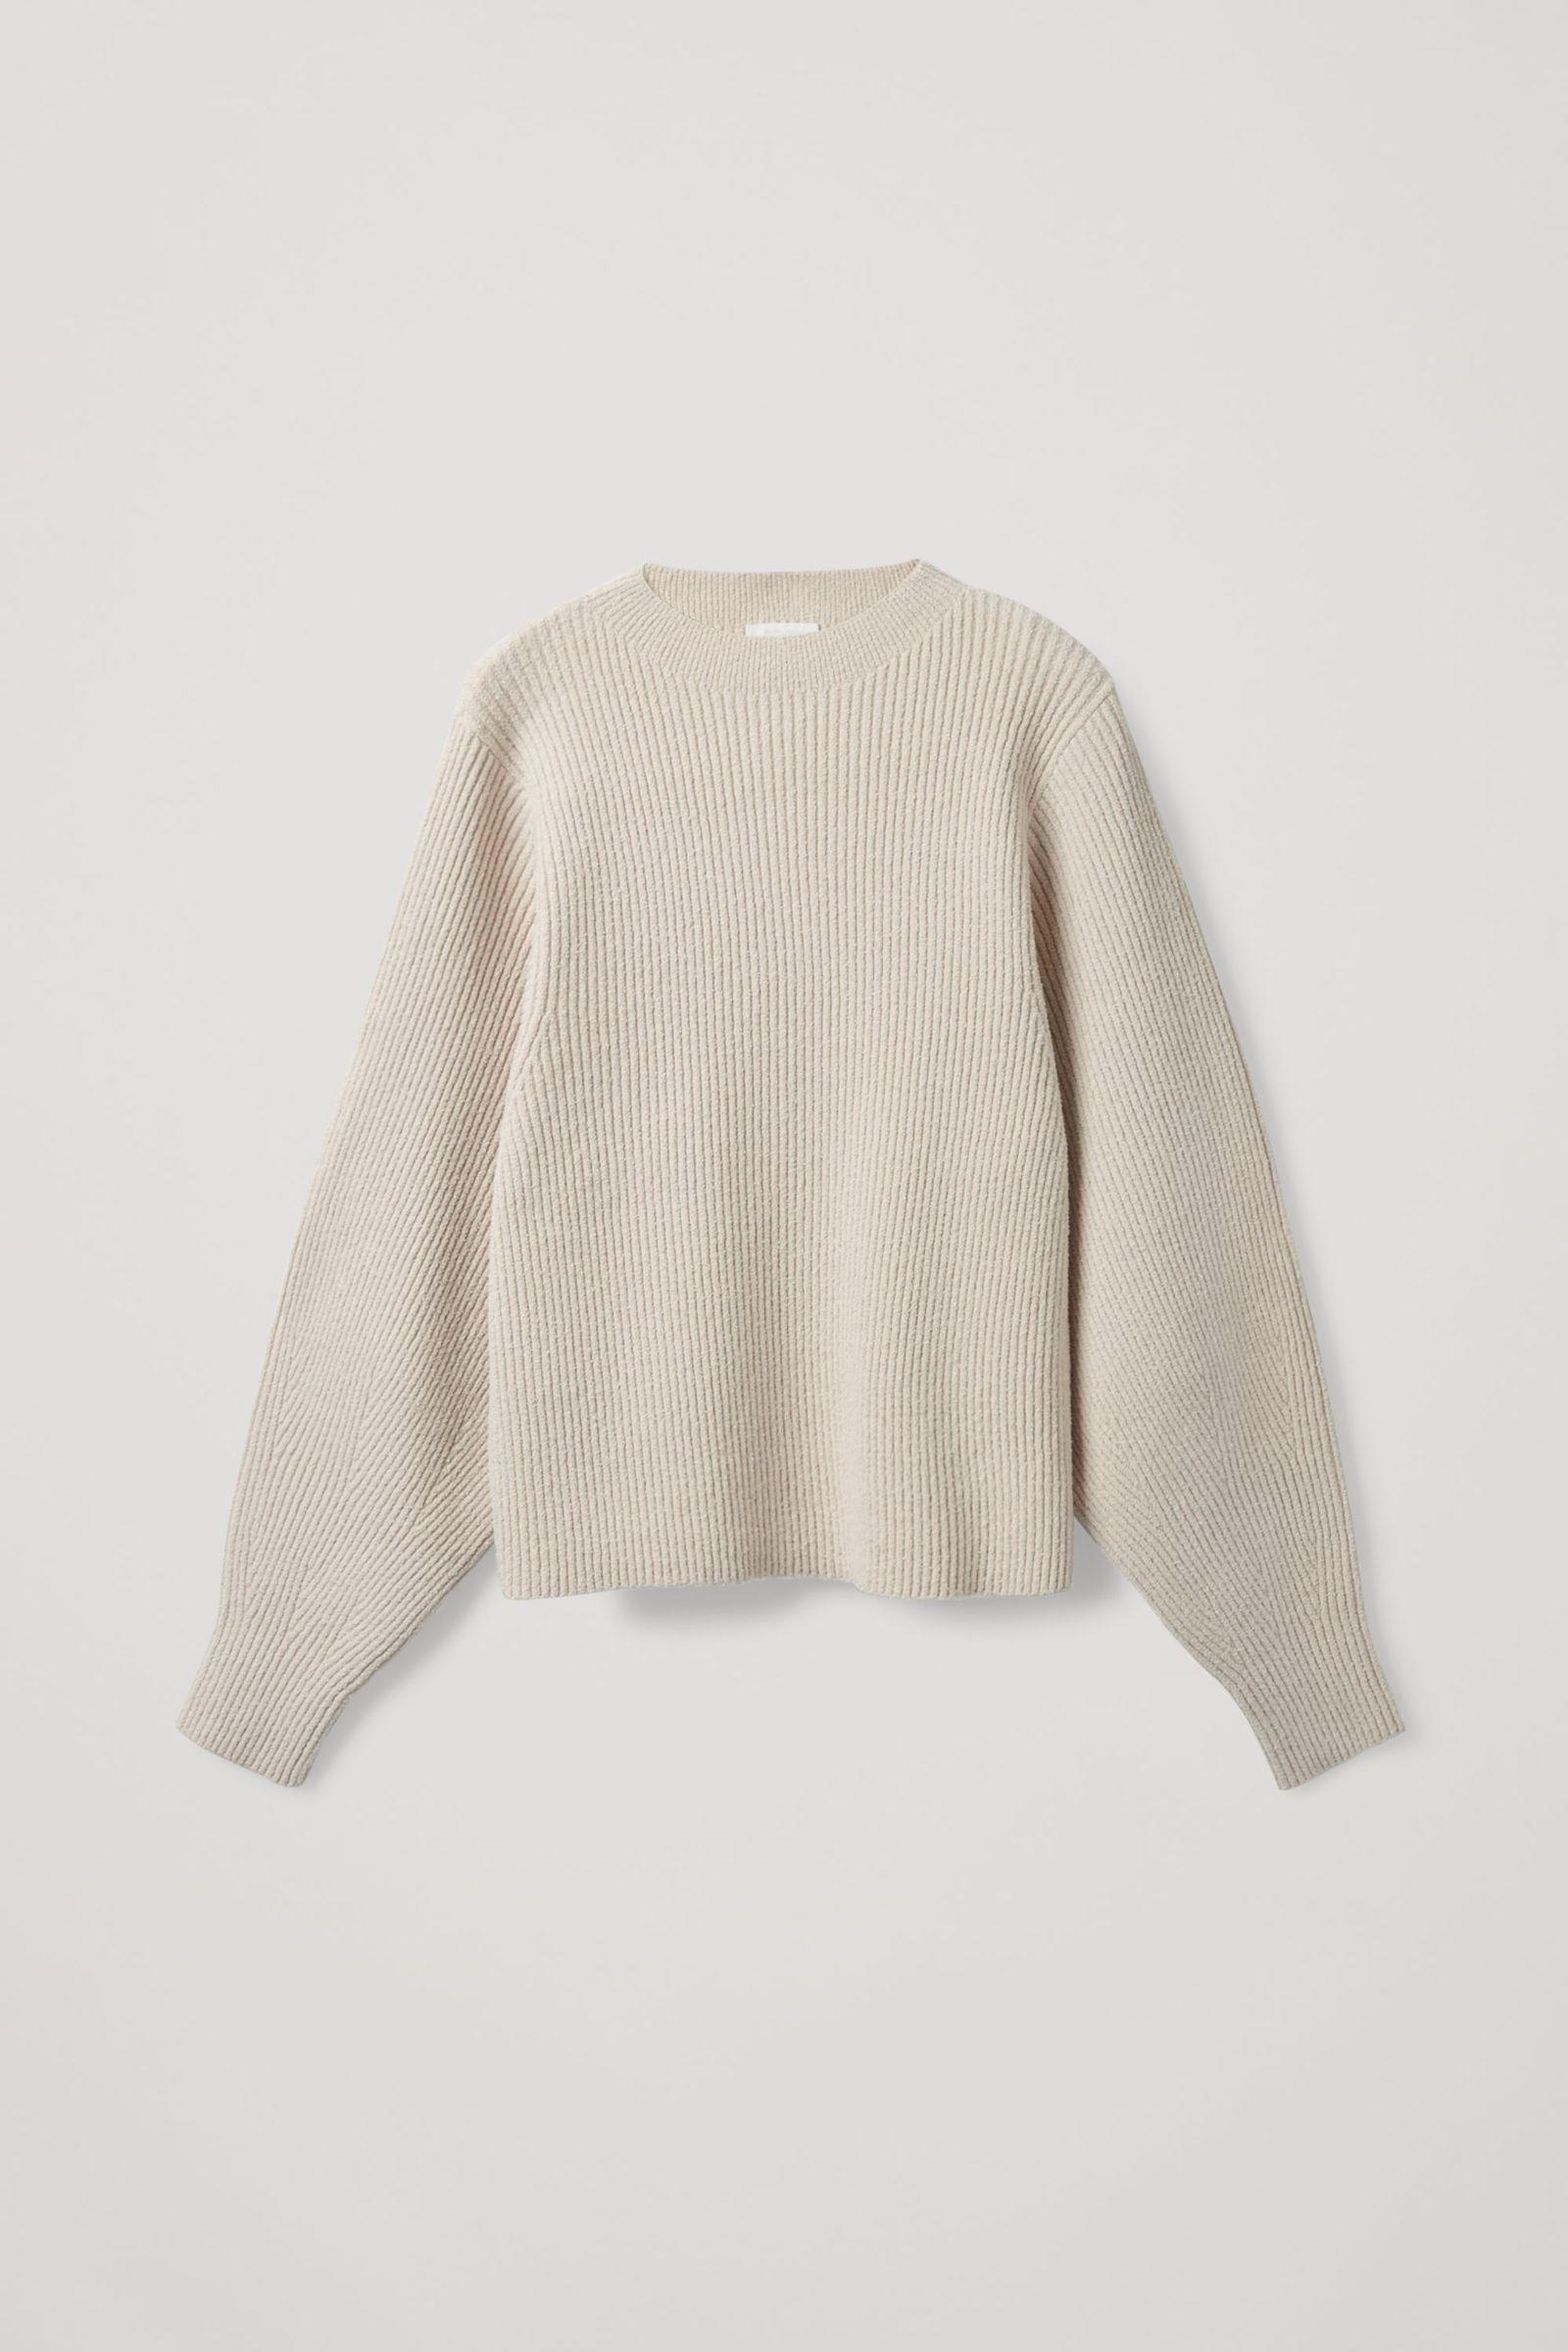 COS 리브드 니트 스웨터의 베이지컬러 Product입니다.